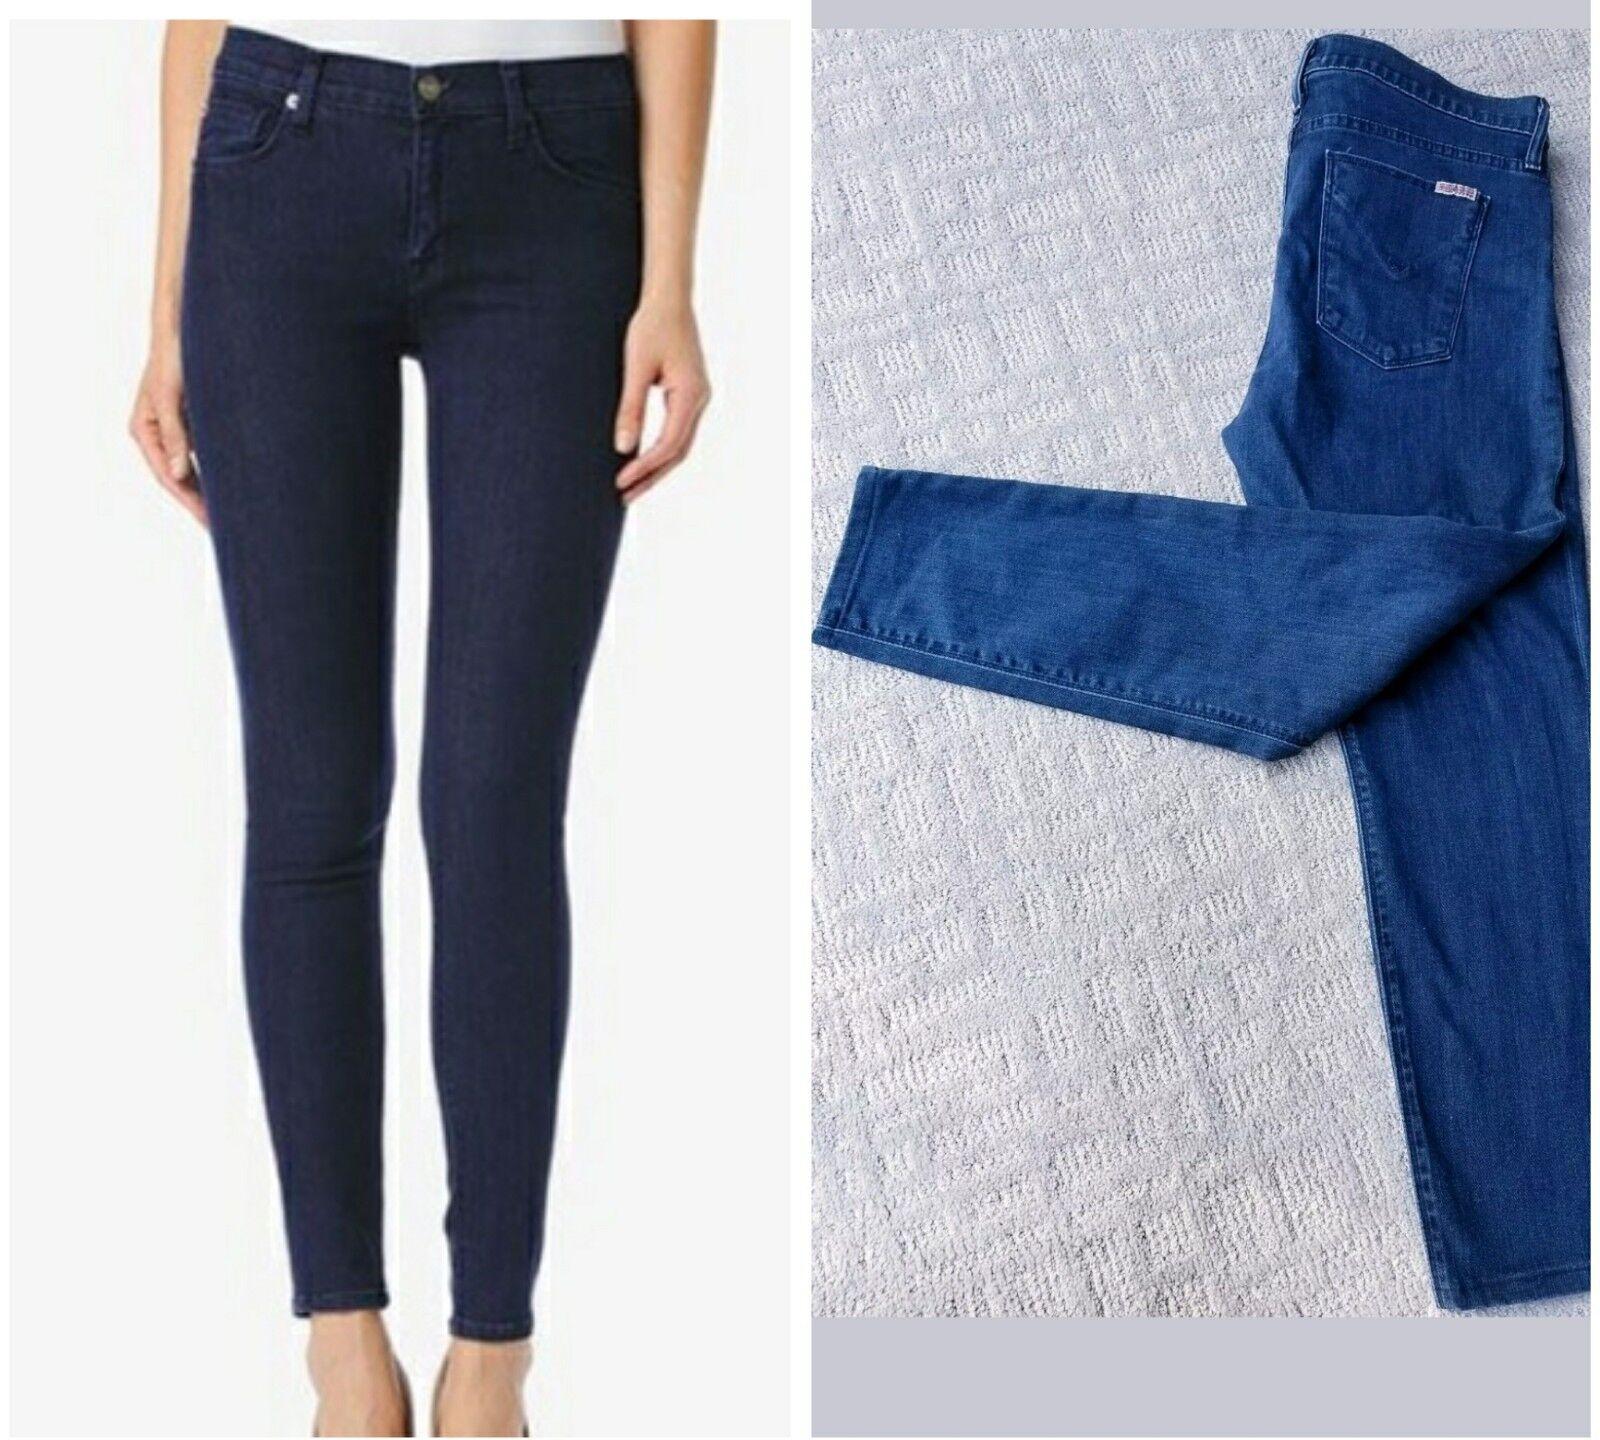 Hudson Runway Medium Wash Midrise NICO Super Skinny ankle jeans size 31x26 L EUC